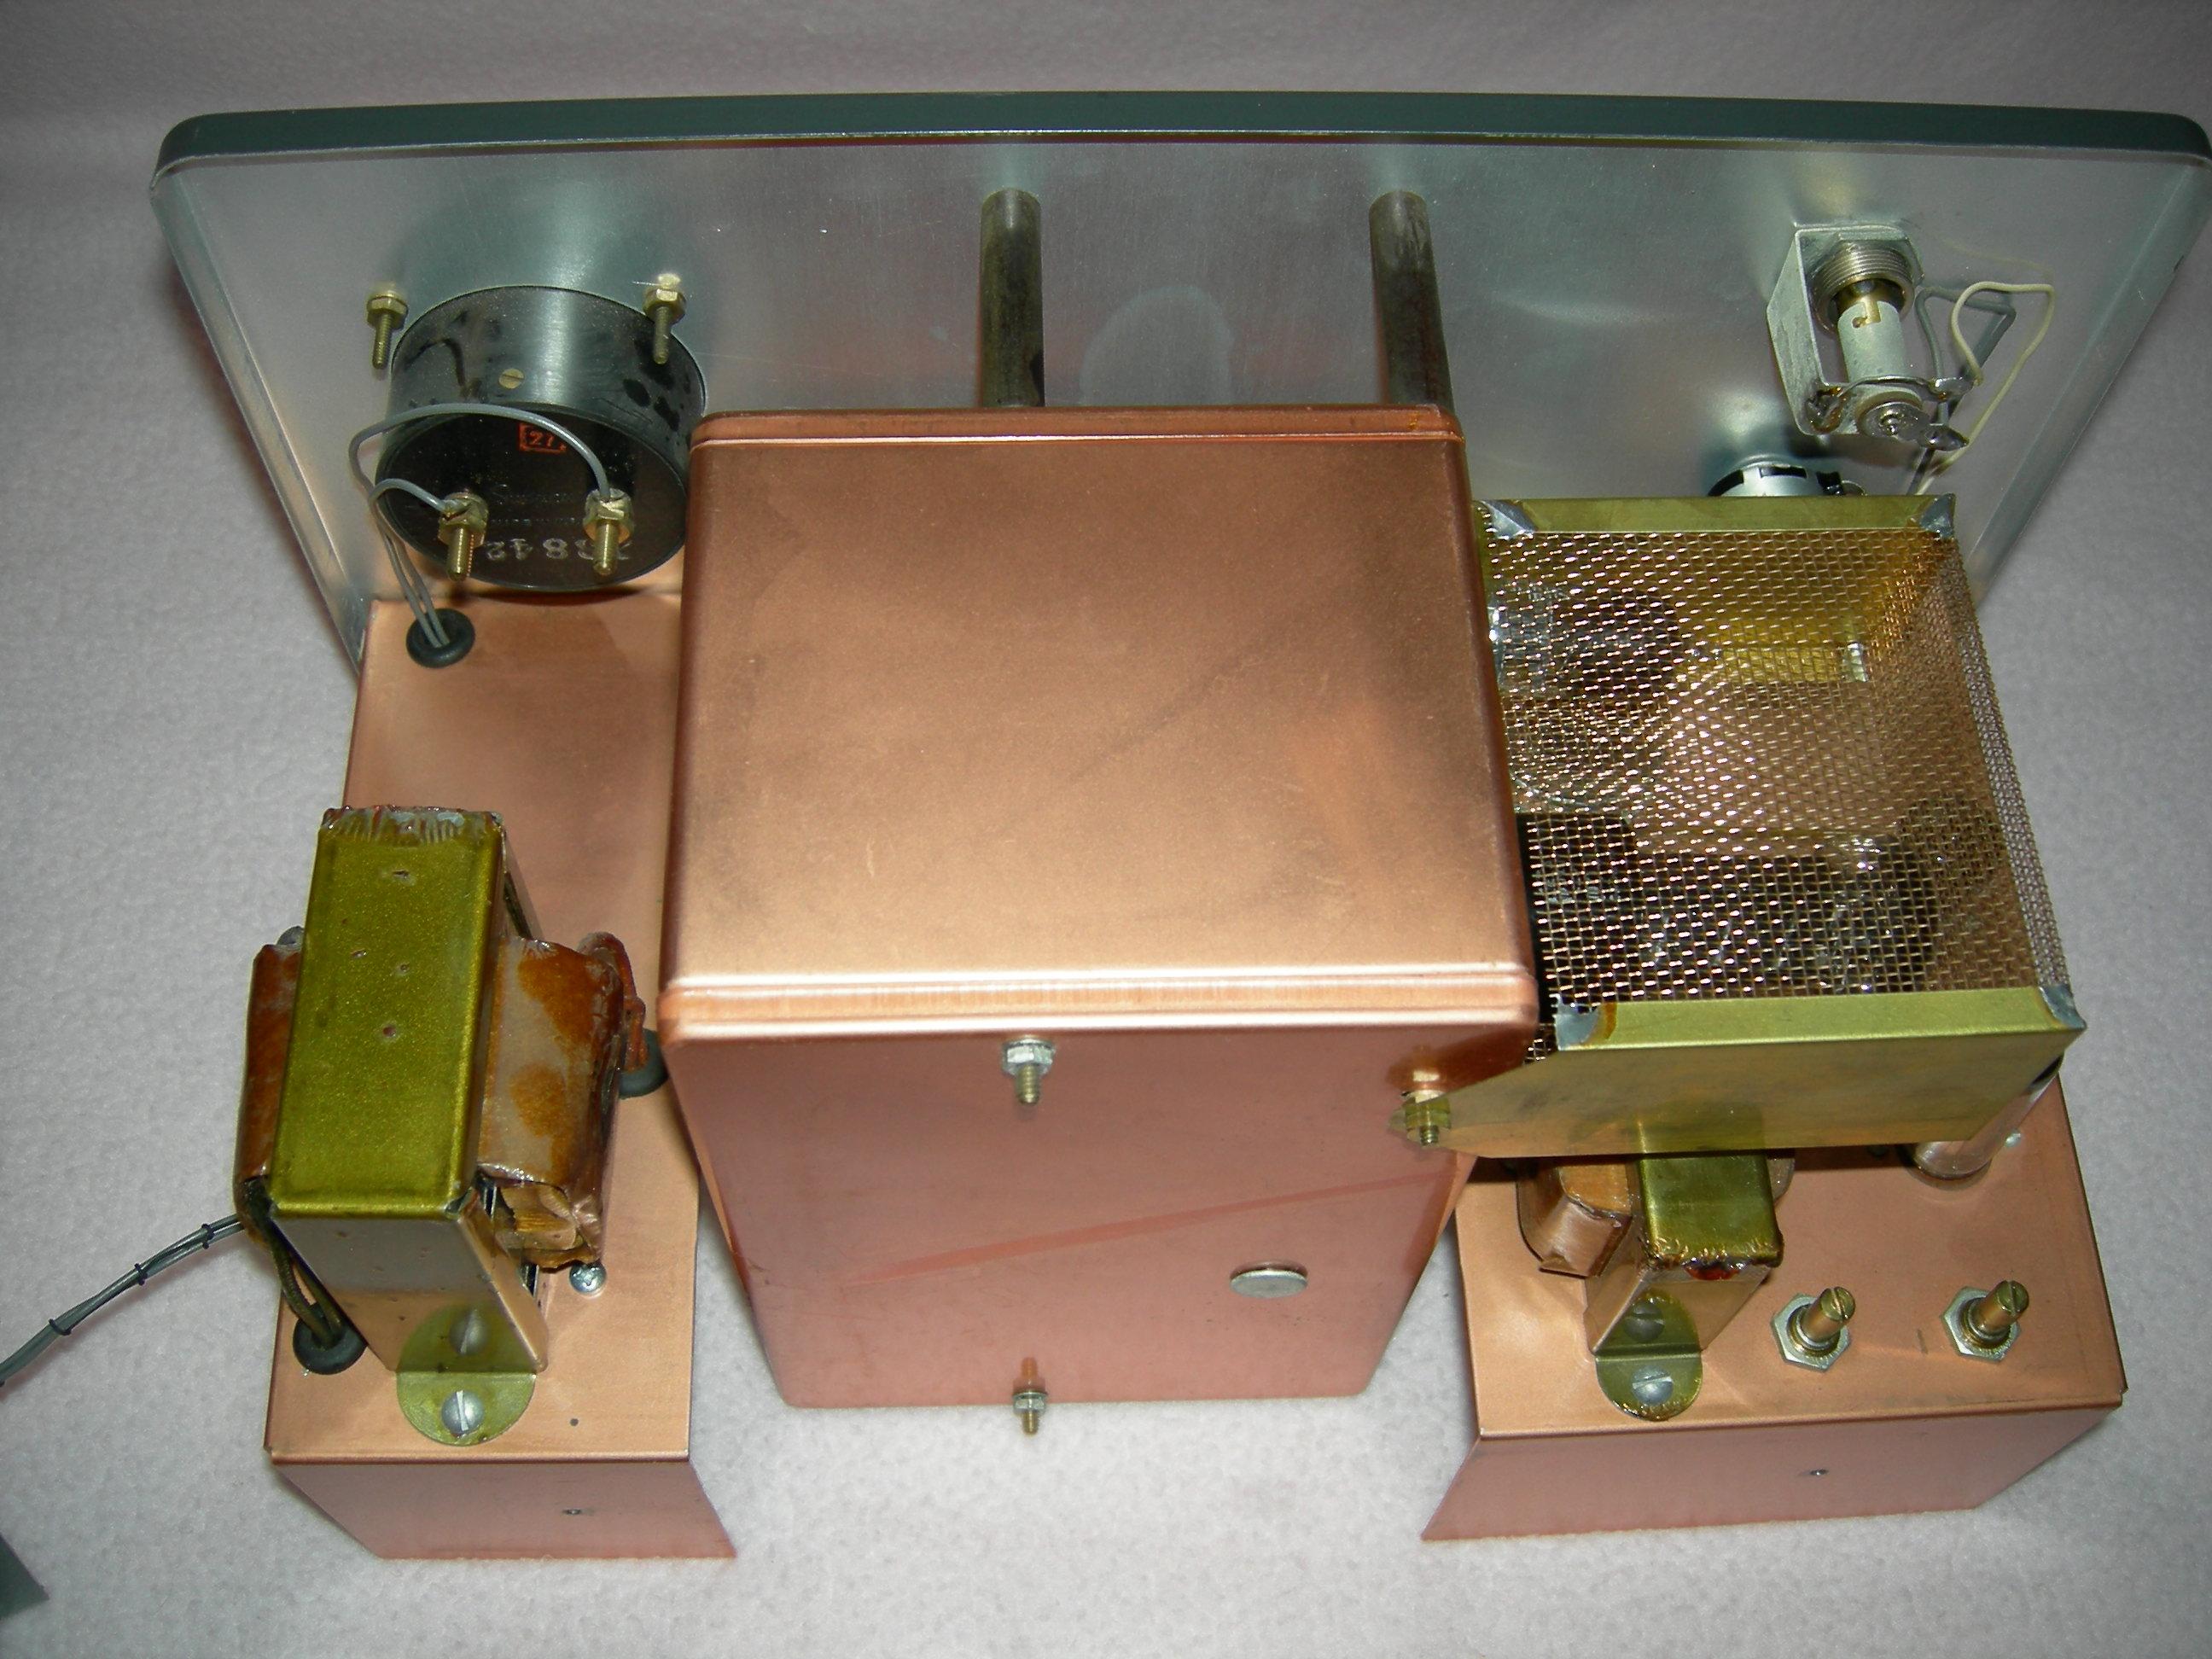 Heathkit LG-1 Laboratory Type Signal Generator 002